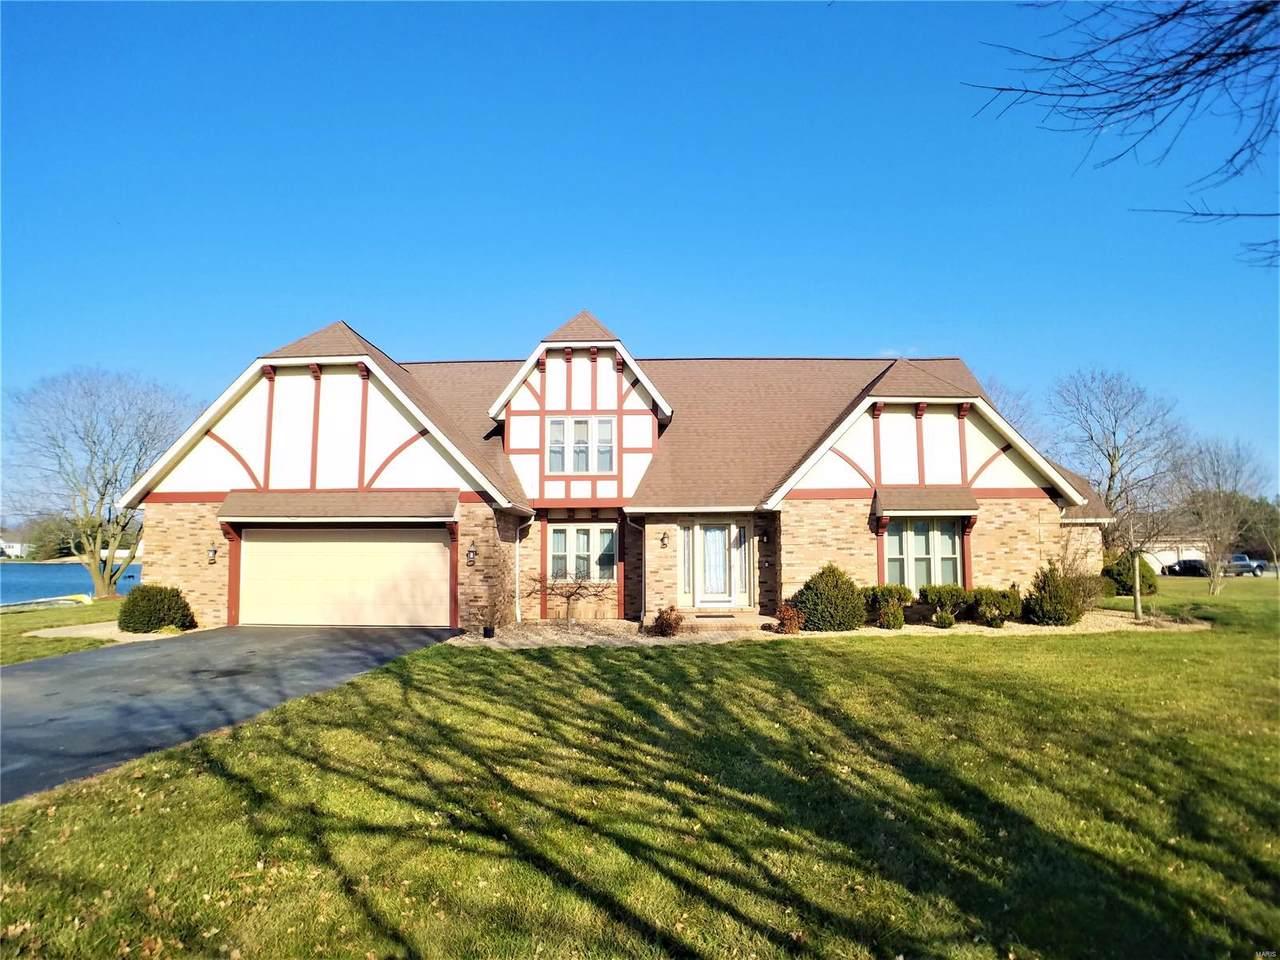 4036 Chestnut Oak Drive - Photo 1